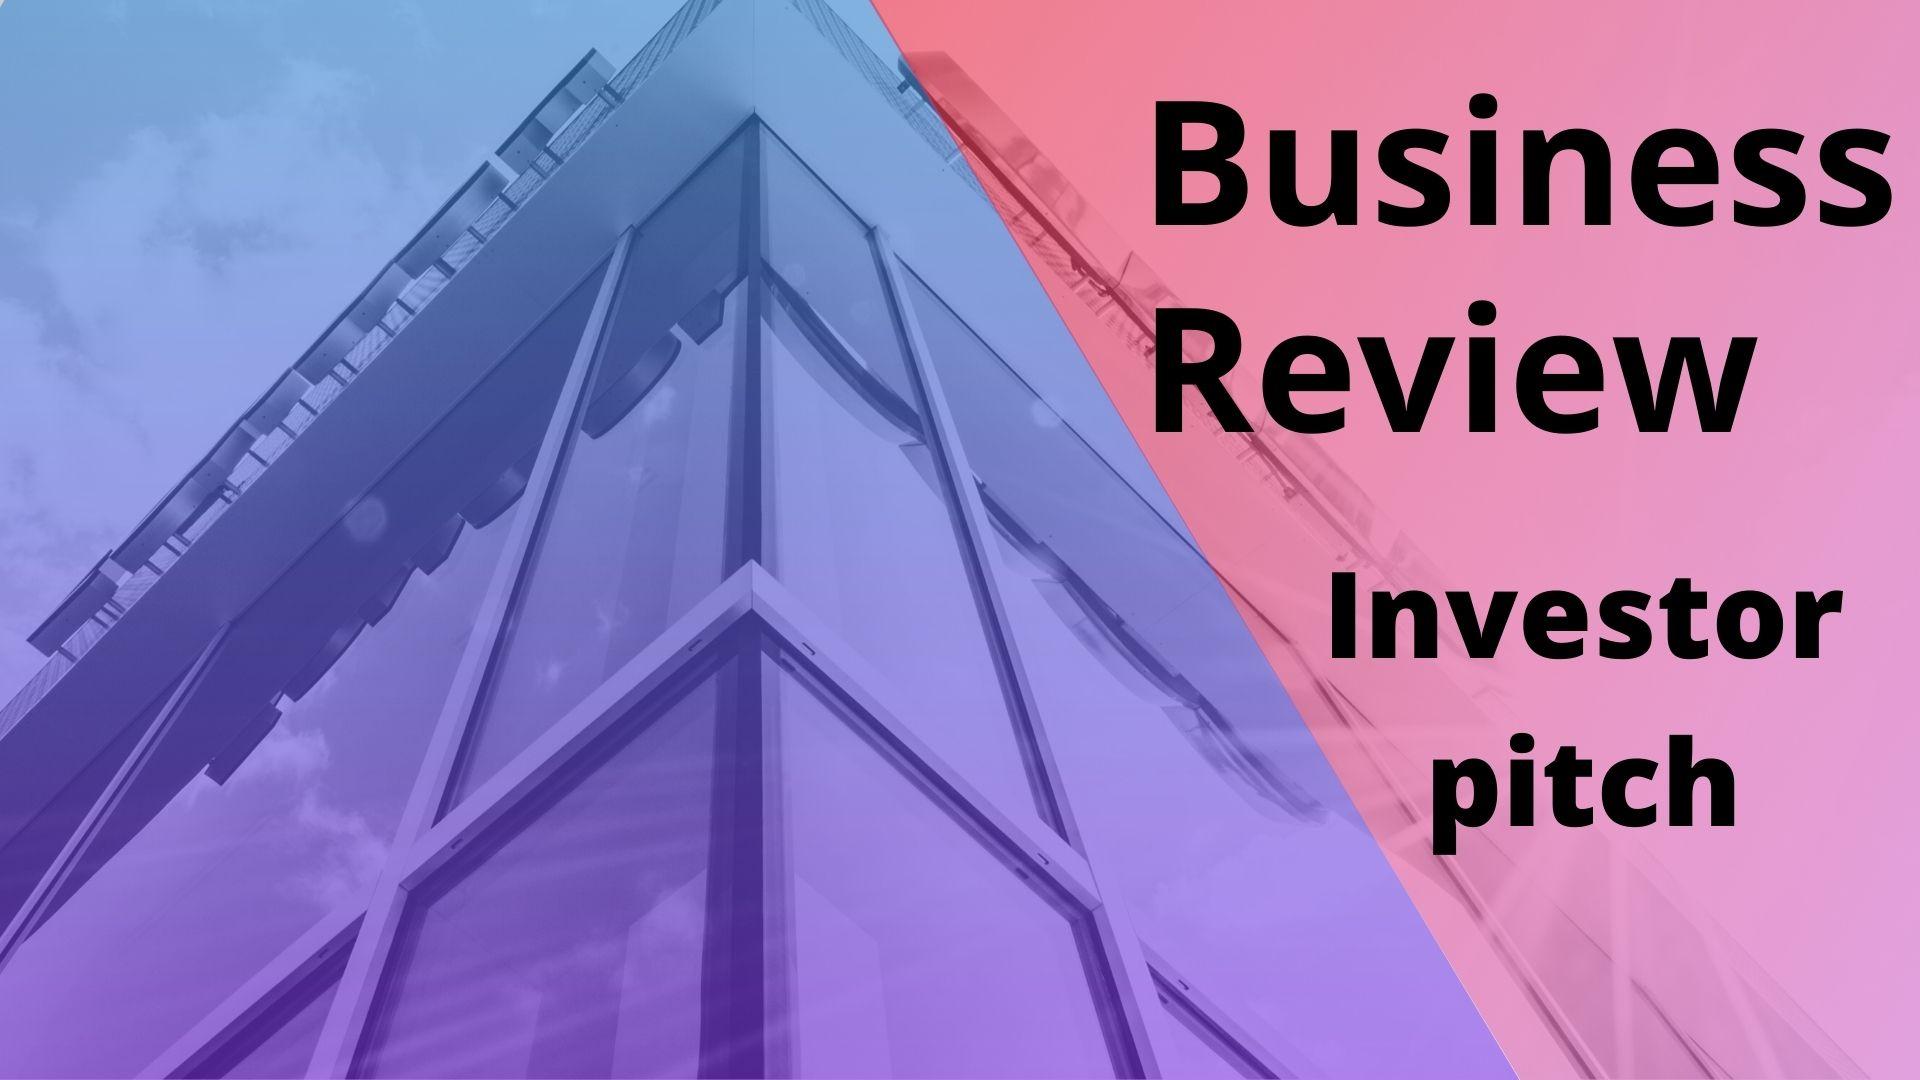 I will make professional business presentation slides